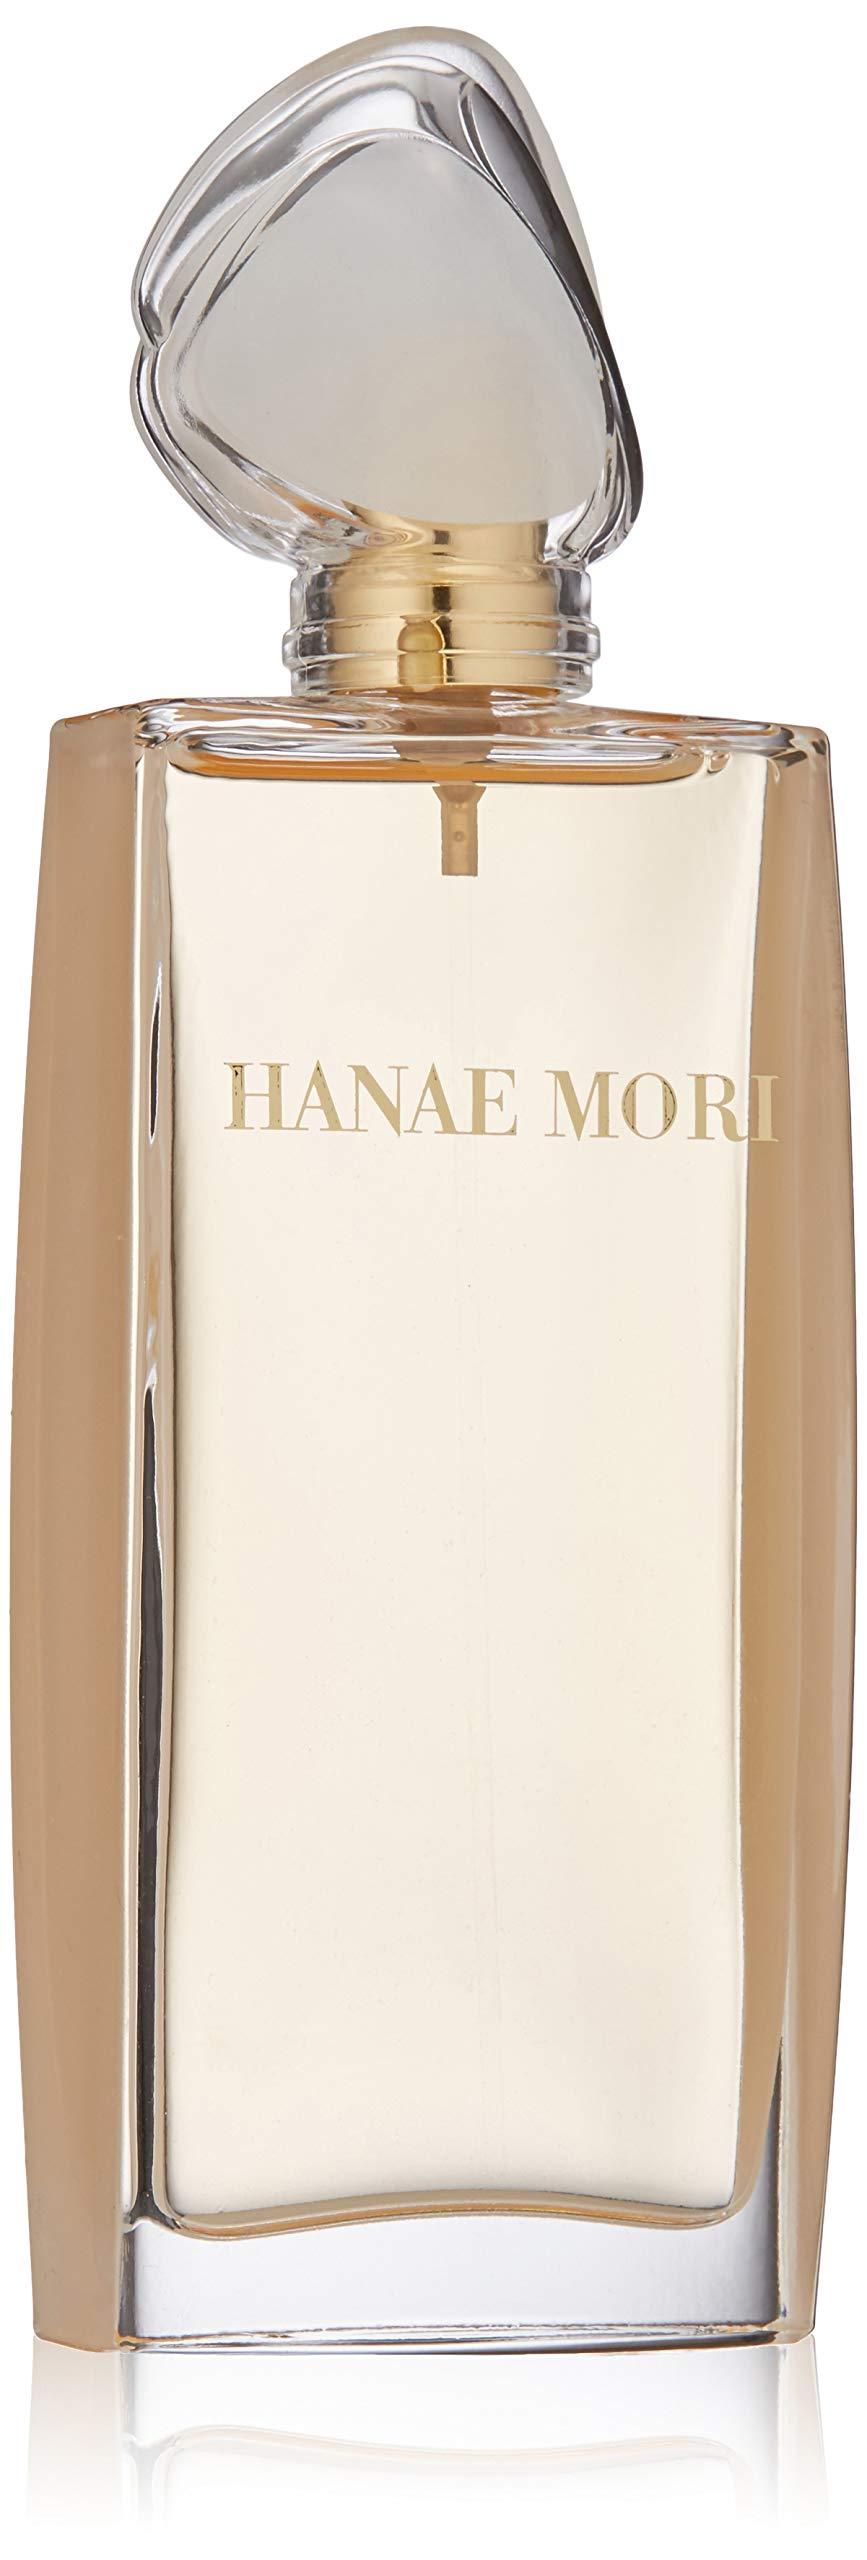 Hanae Mori By Hanae Mori For Women. Eau De Toilette Spray 3.4 Ounces by Hanae Mori